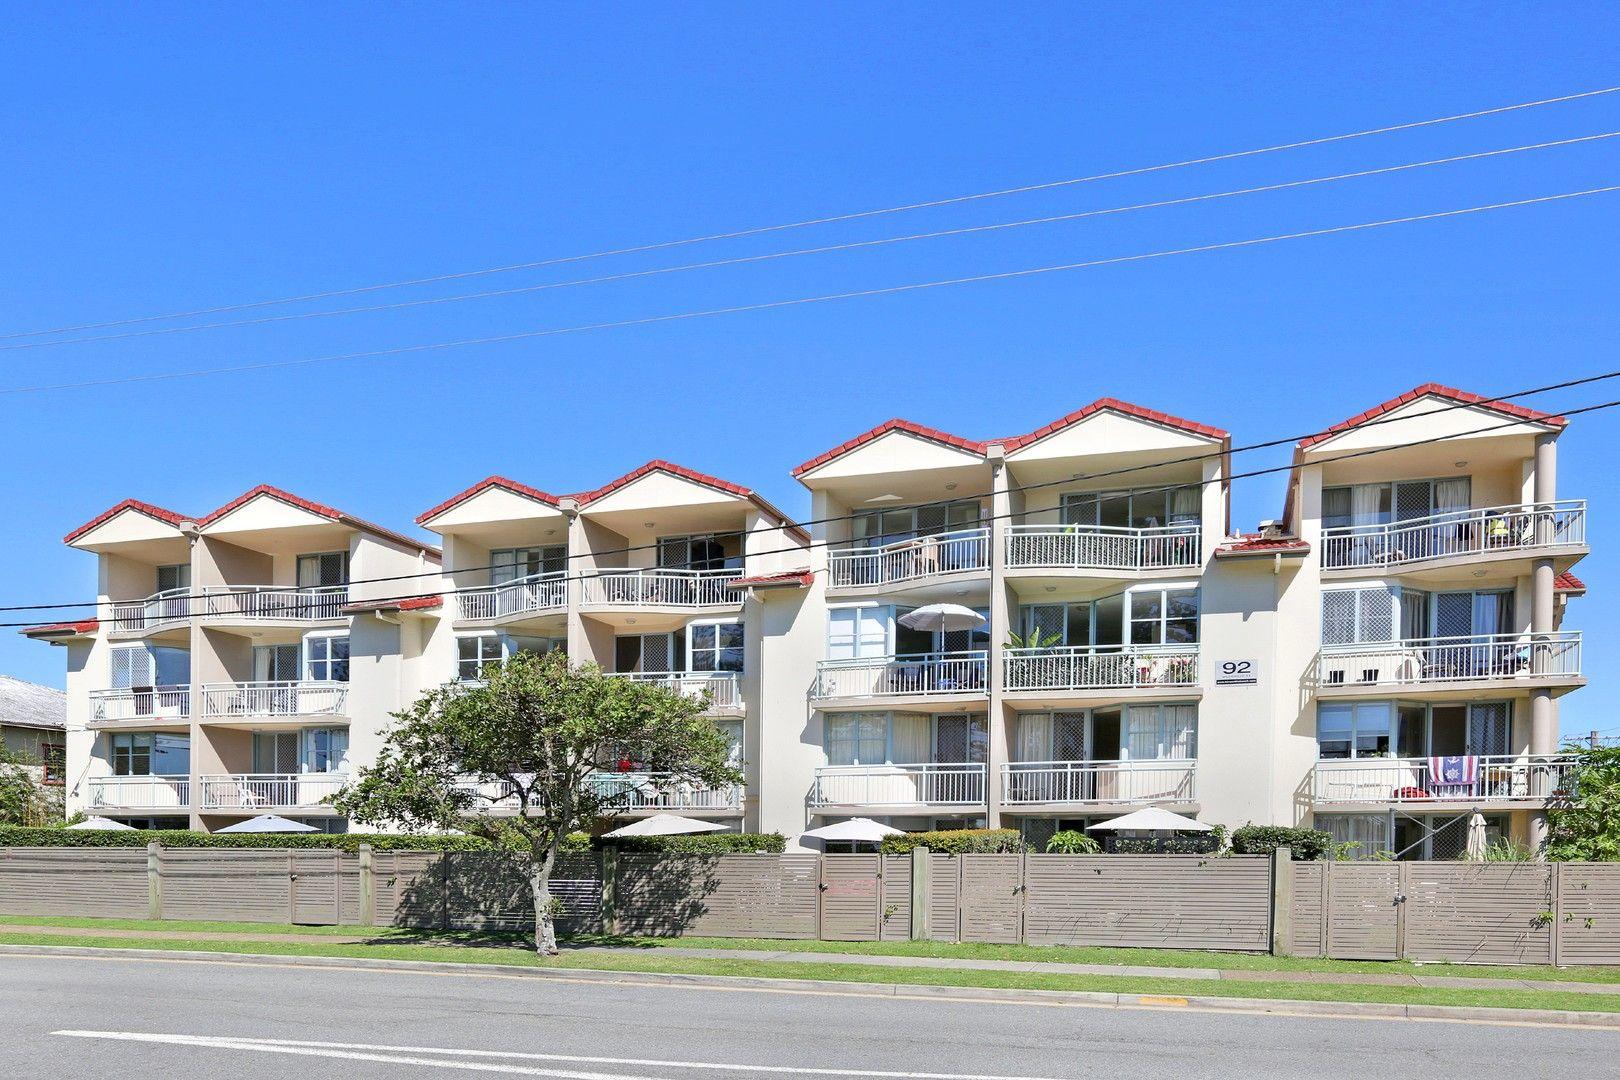 210/92 Musgrave Street, Kirra QLD 4225, Image 0